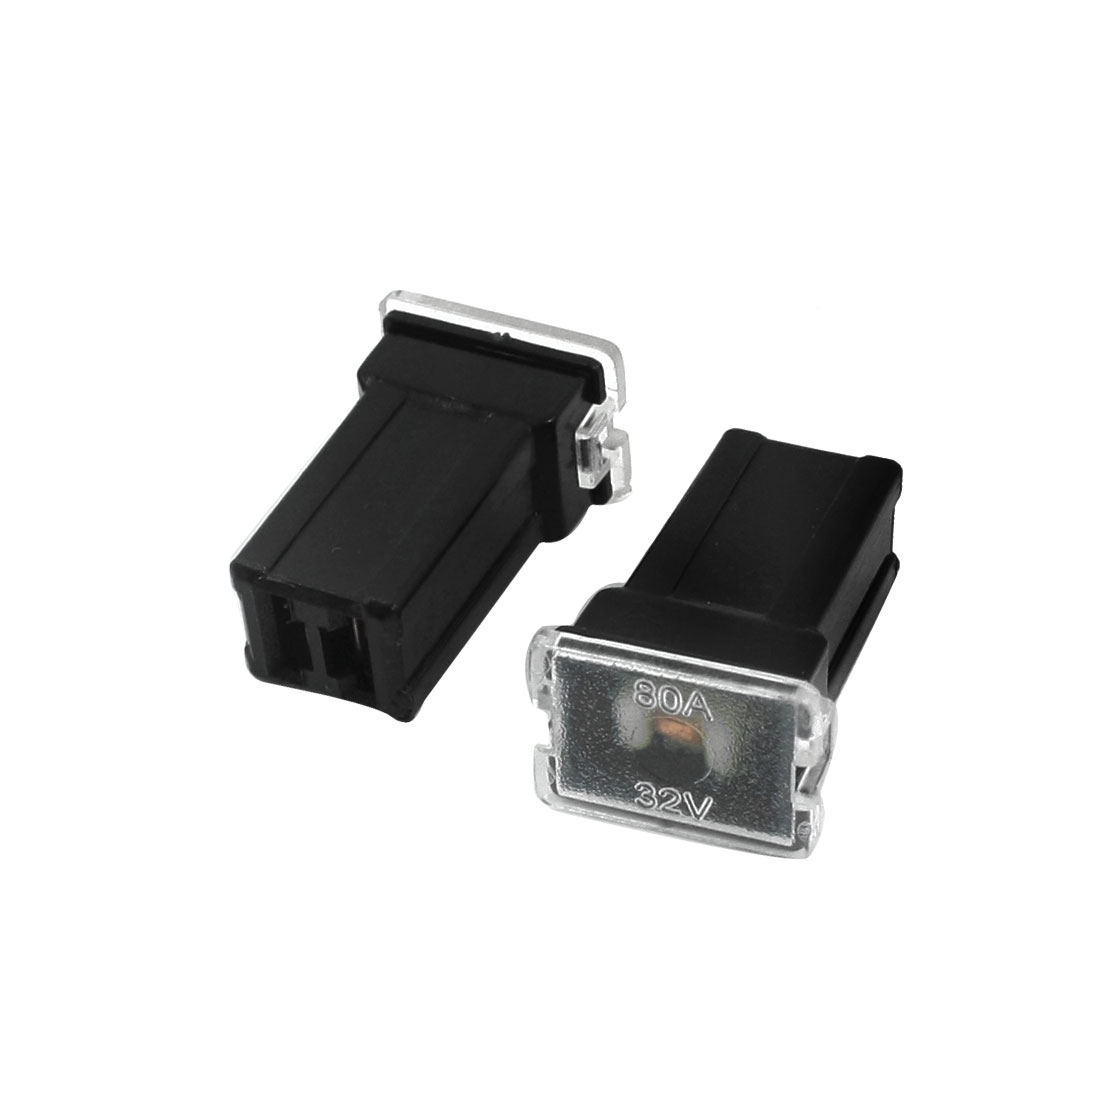 2Pcs Car Vehicle Automotive 2 Terminals Female Plug Type Cartridge PAL Fuse Black DC 32V 80A